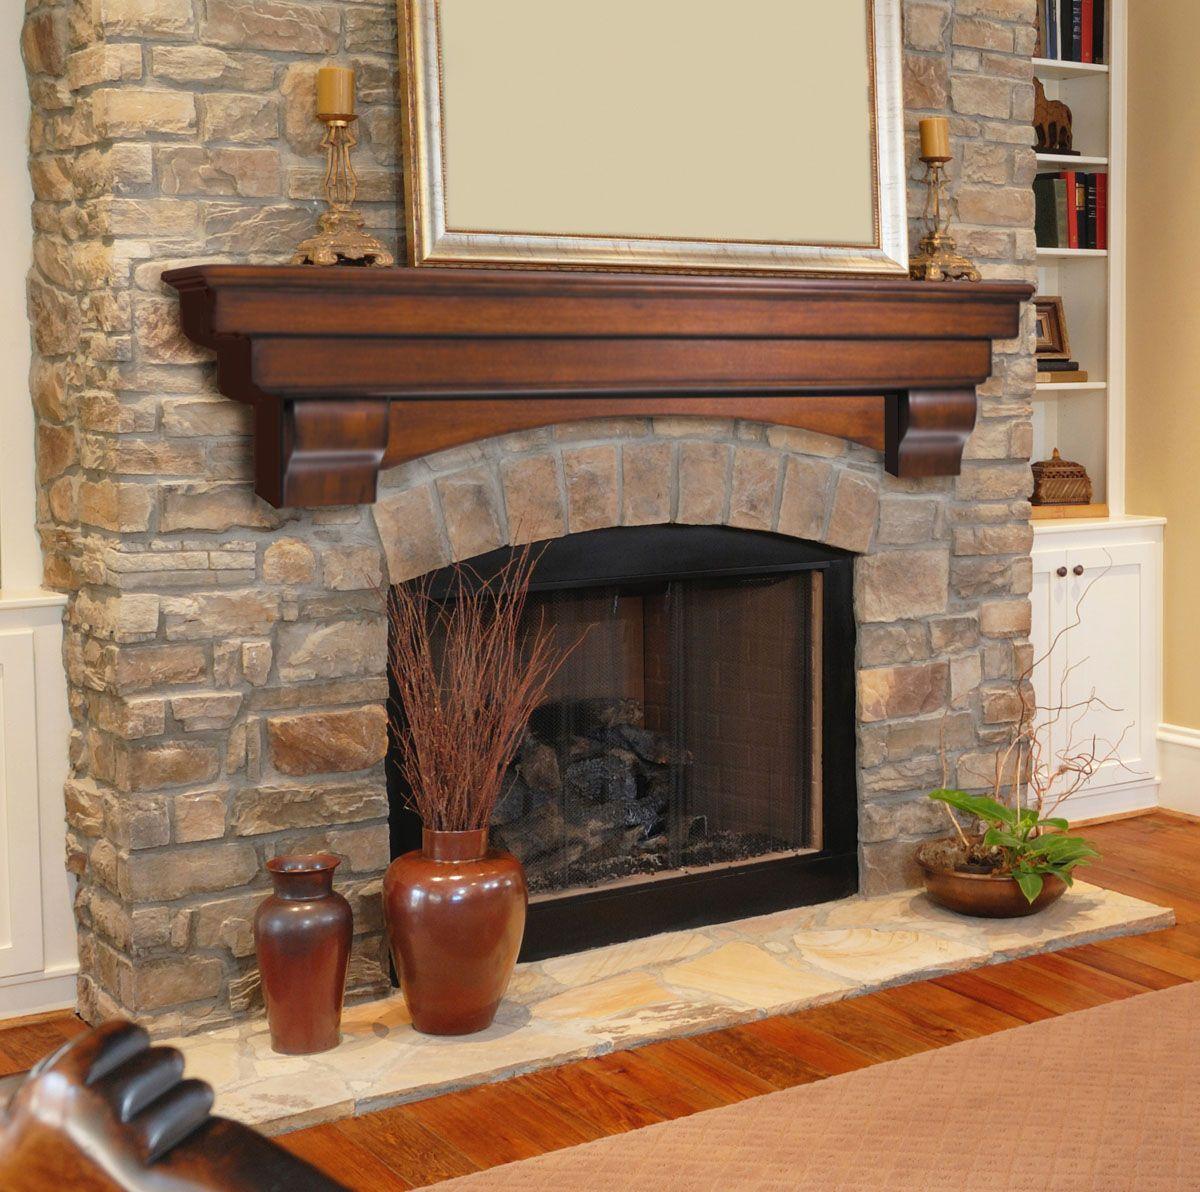 Perfekt Mantel And Stone Fireplace. KaminverkleidungenKaminideenFeuerstellen Aus  SteinHolz KaminsimseKamin UmgibtHolz ...